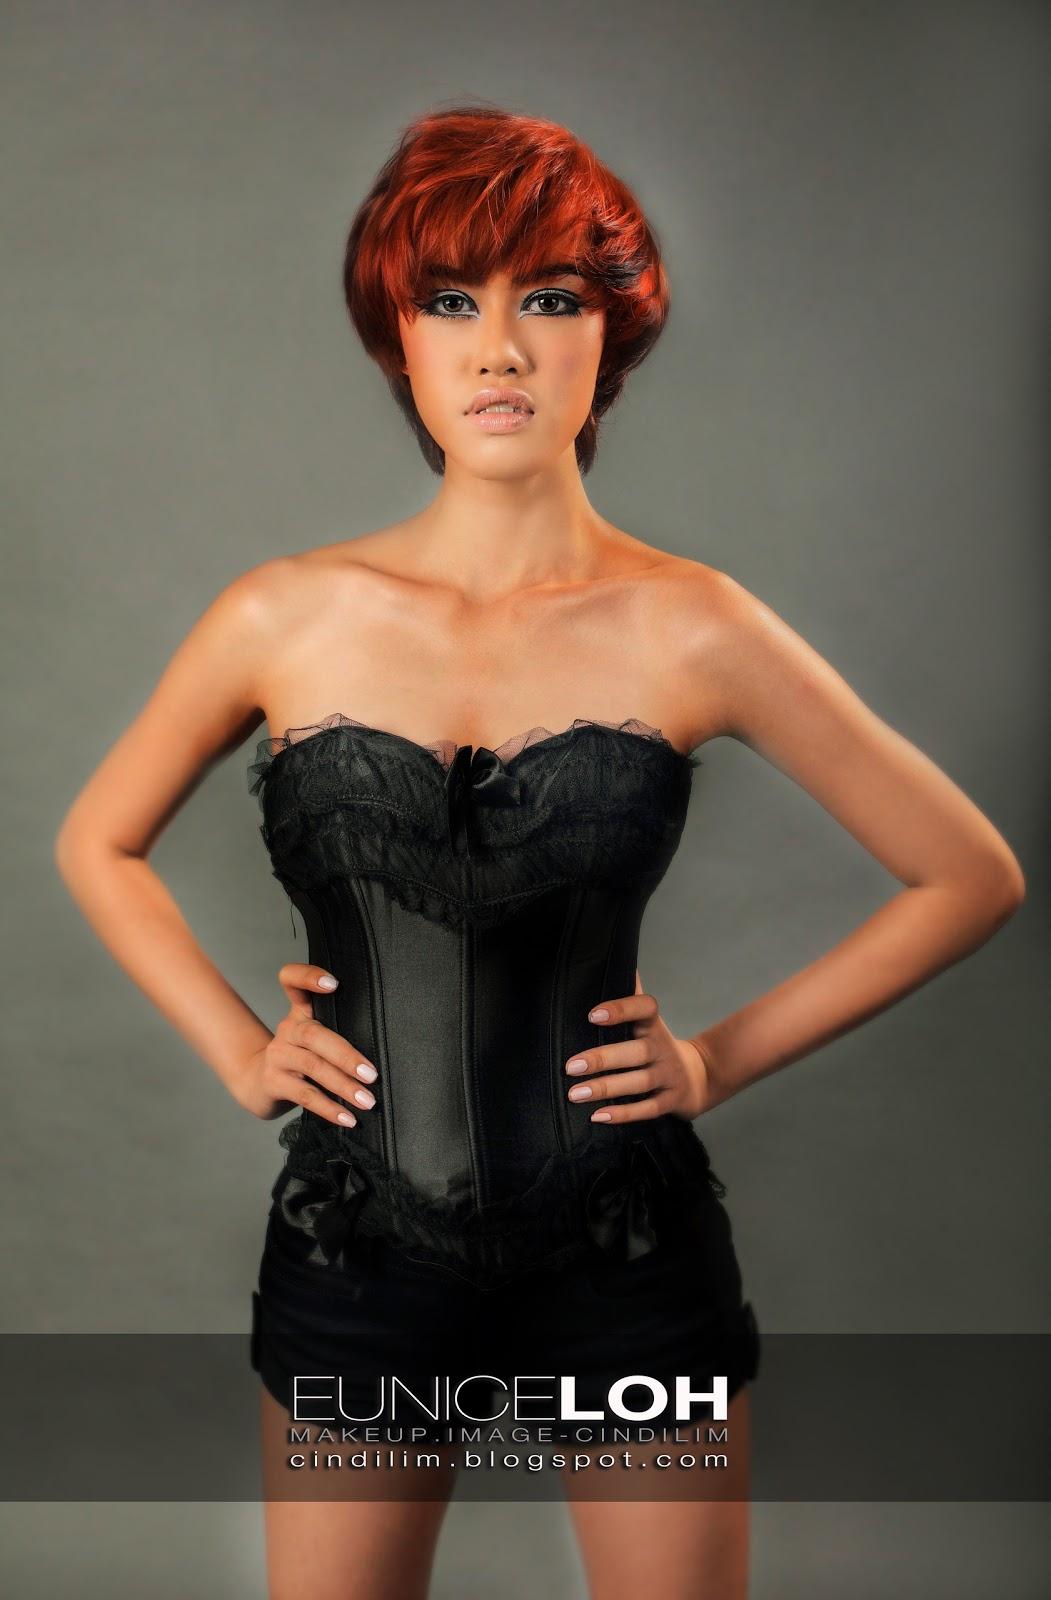 Cindi Pro Makeup Artist Commercial Photoshoot Makeup: :: Cindi Pro. Makeup Artist ::: Red Copper's Eunice Loh